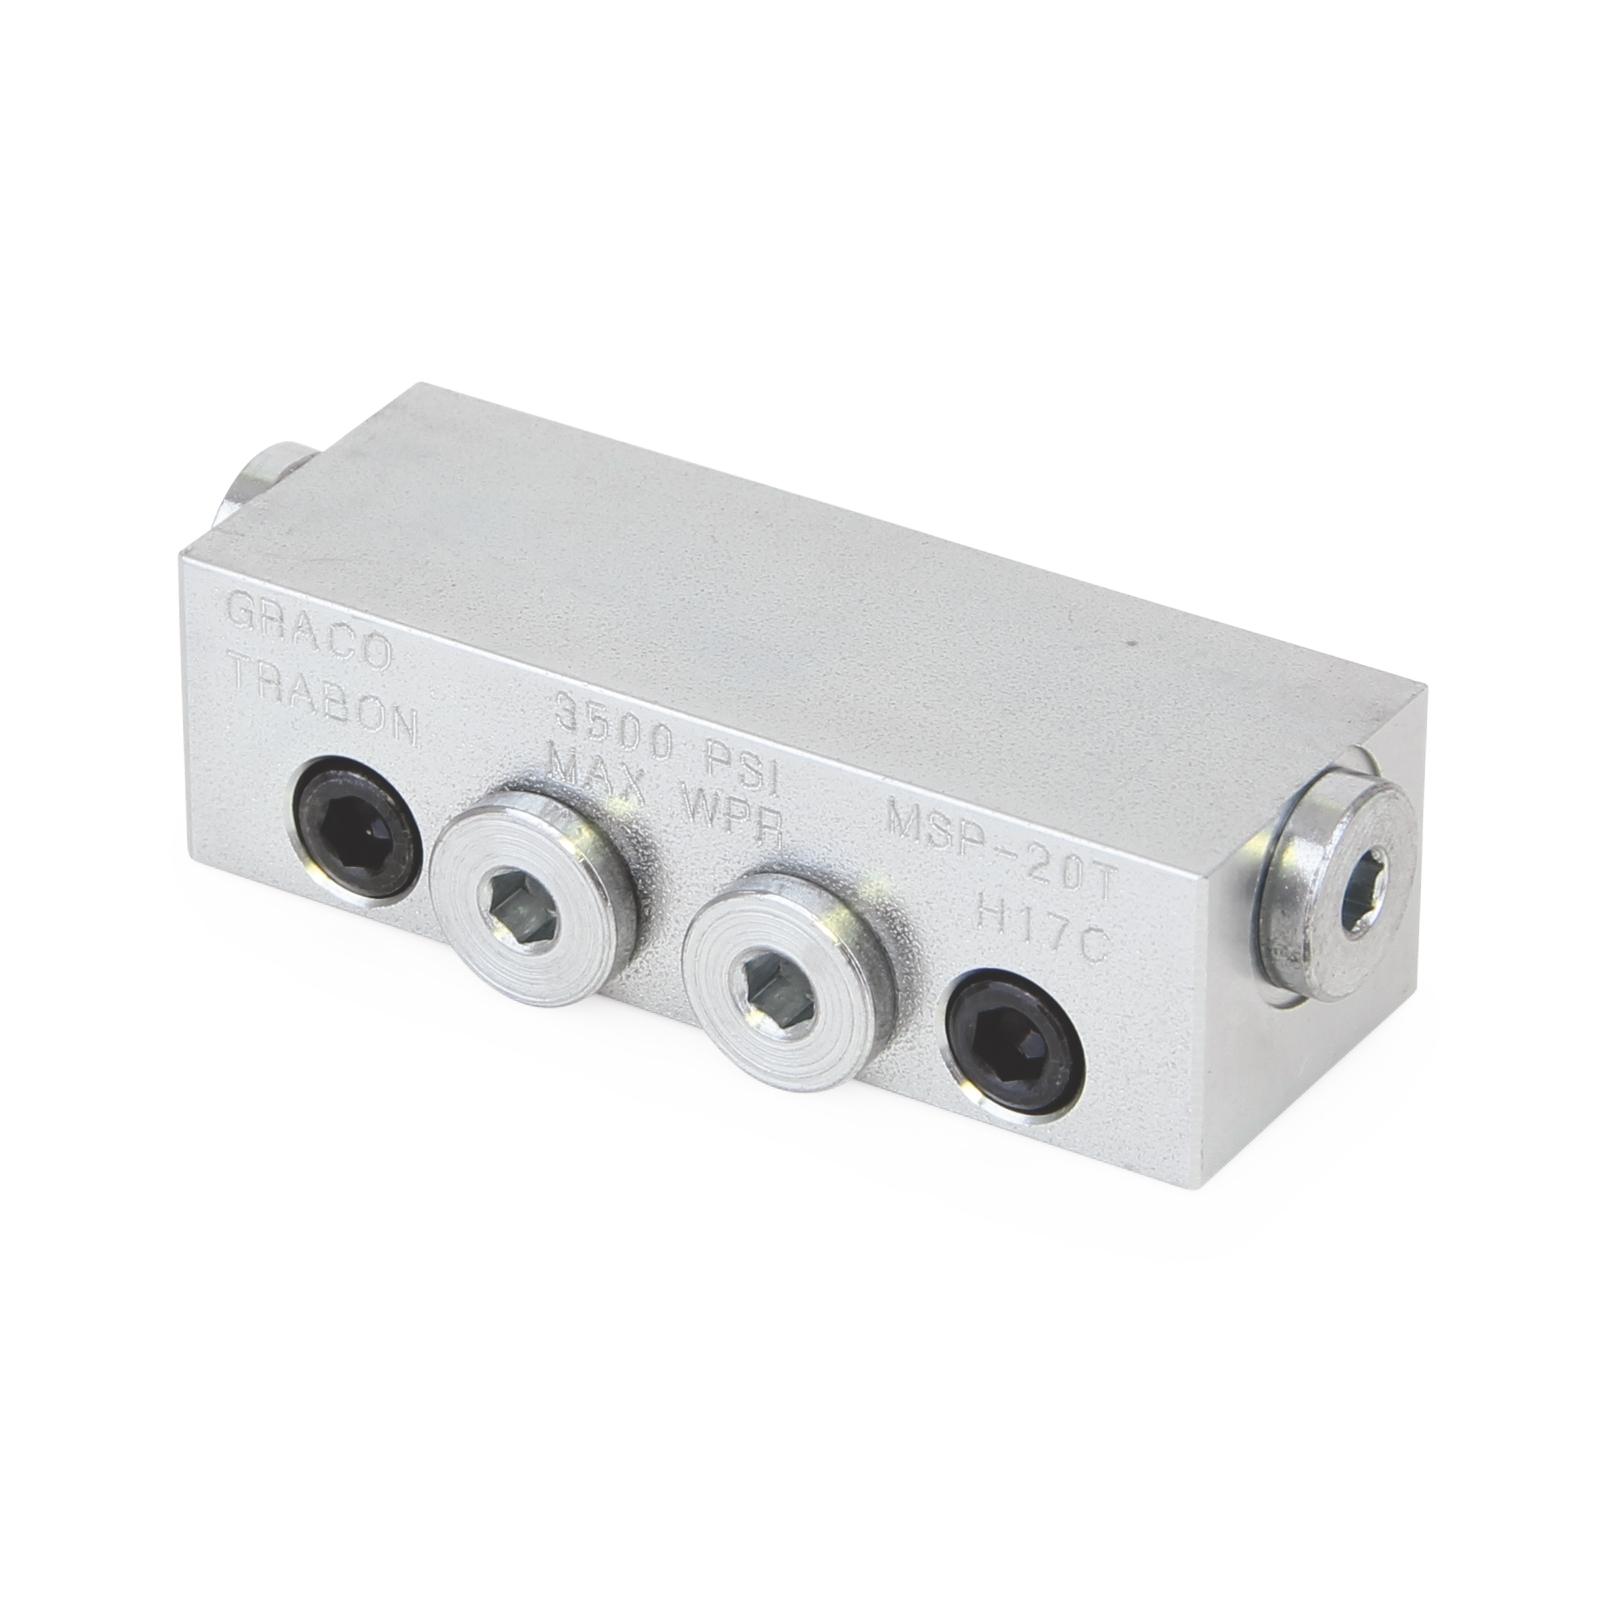 Graco Trabon Modular Valve Assembly MSP-30S